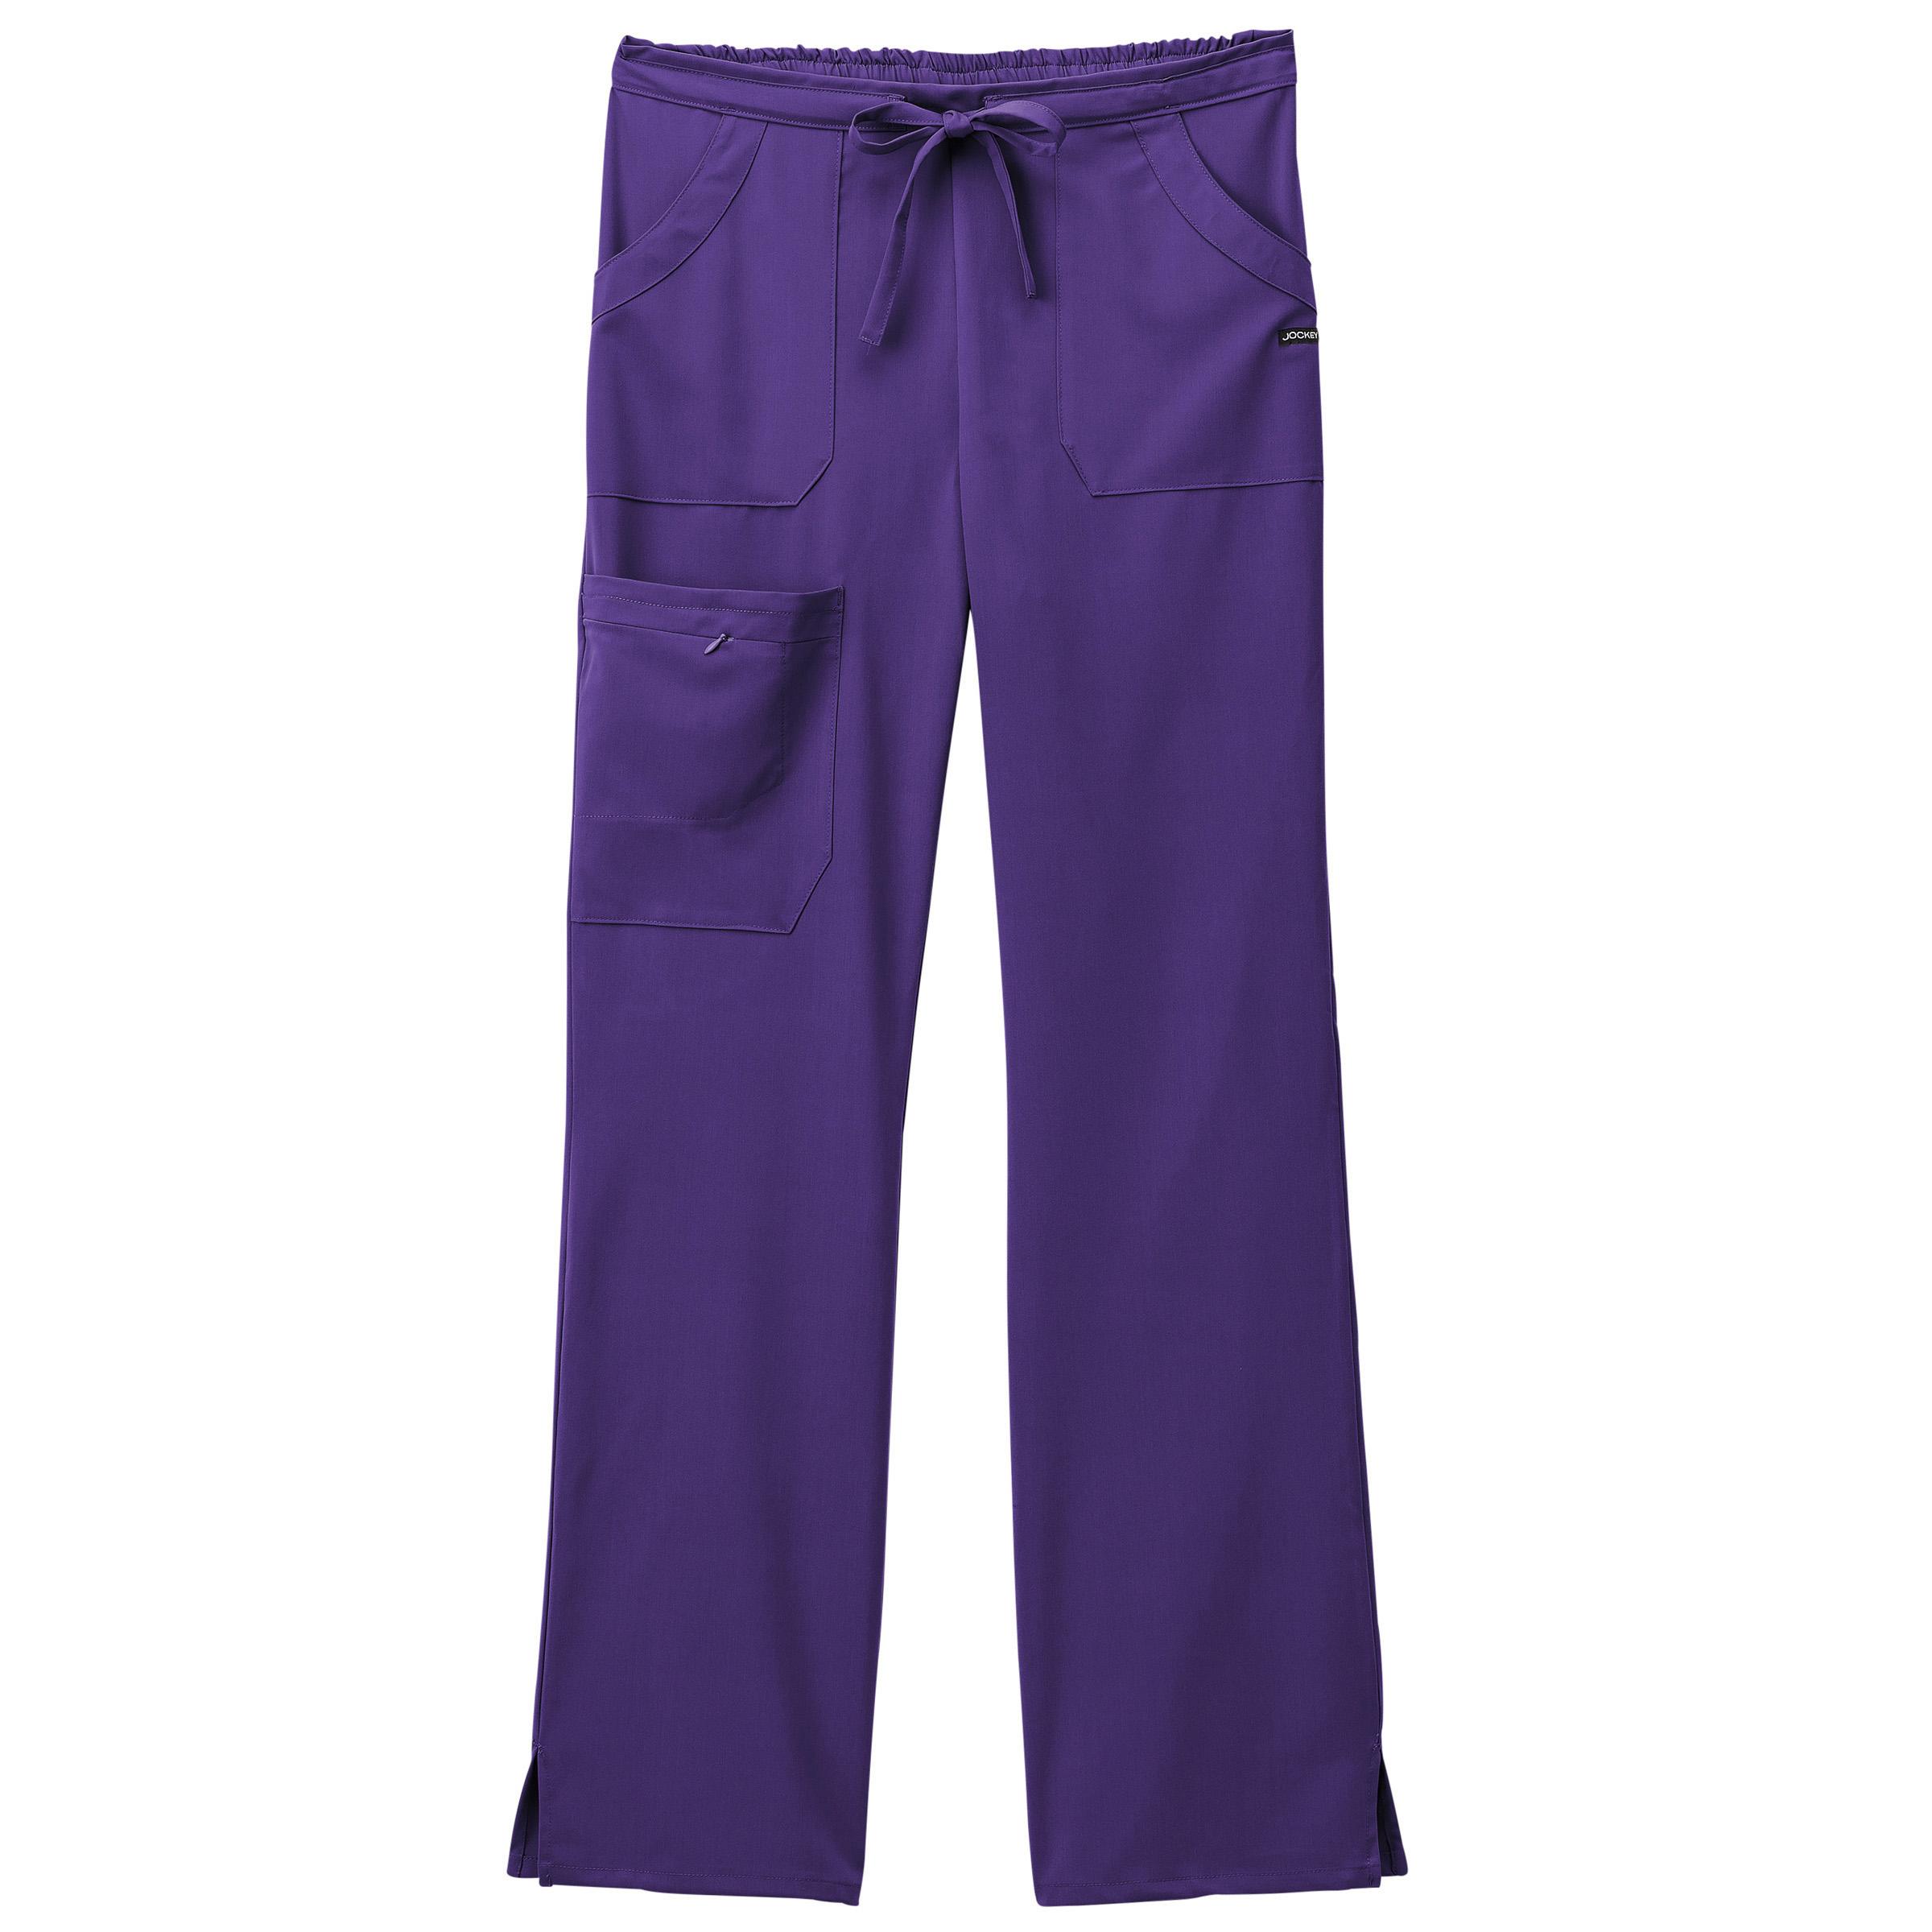 Jockey® Classic Ladies Tunneled Drawstring Waist Pant 2357